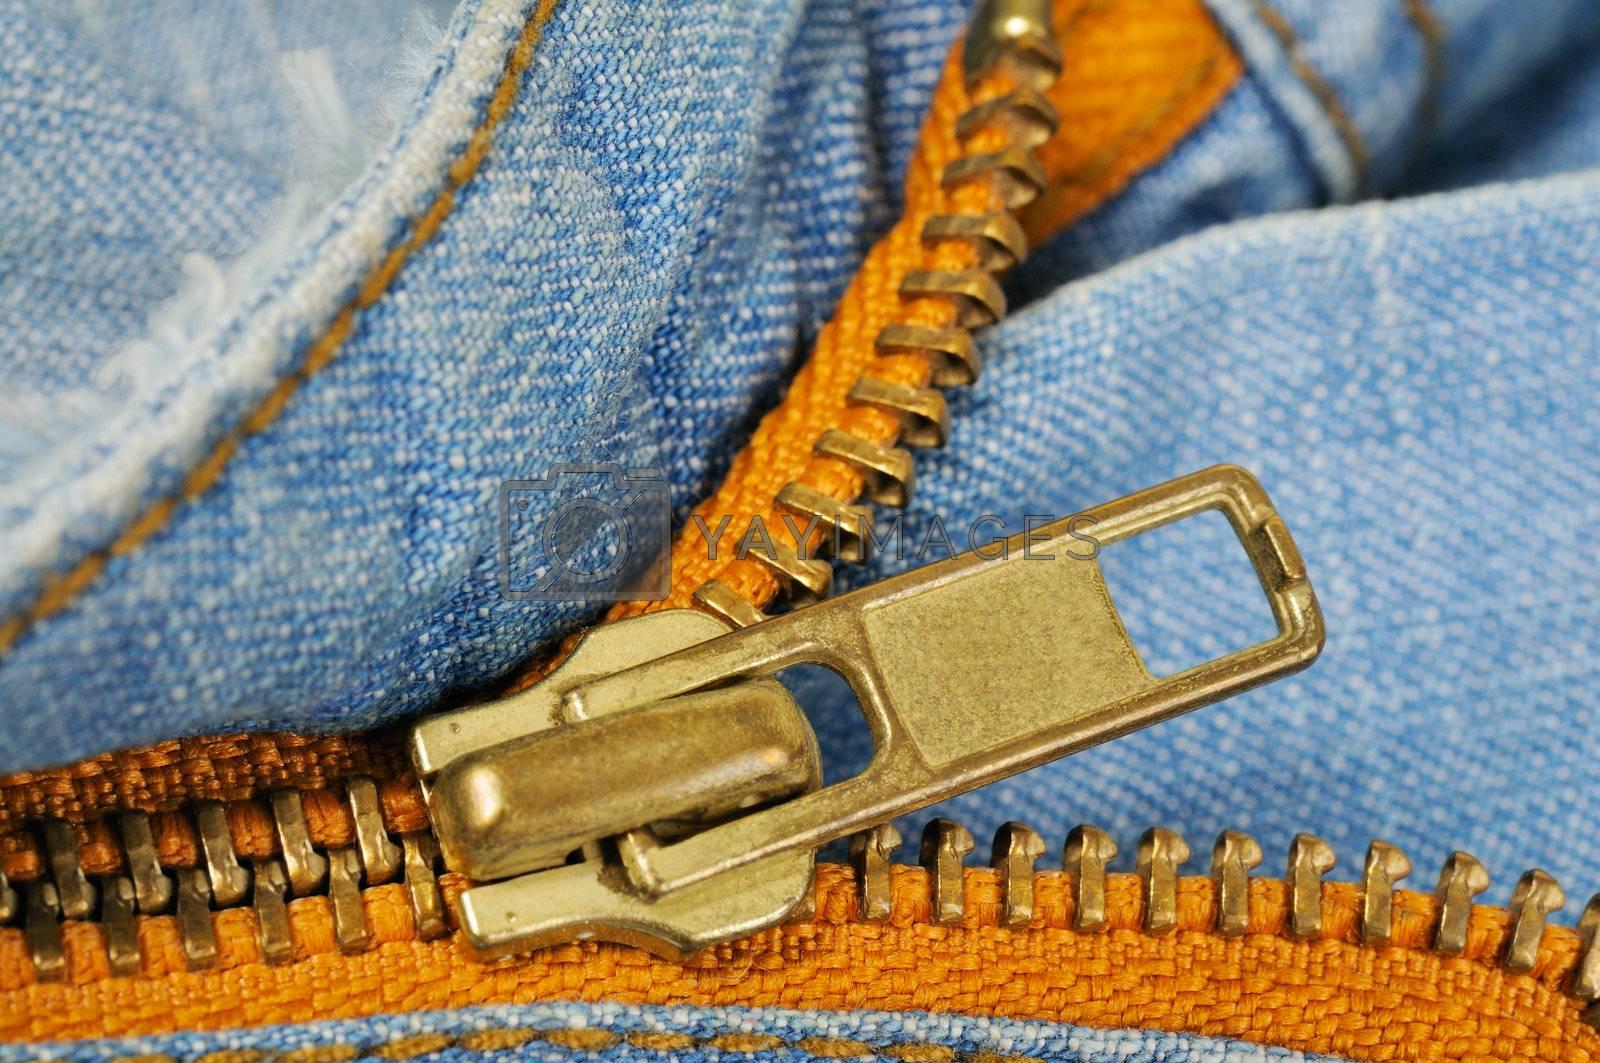 Zipper on the blue indigo jeans. Macro photo.